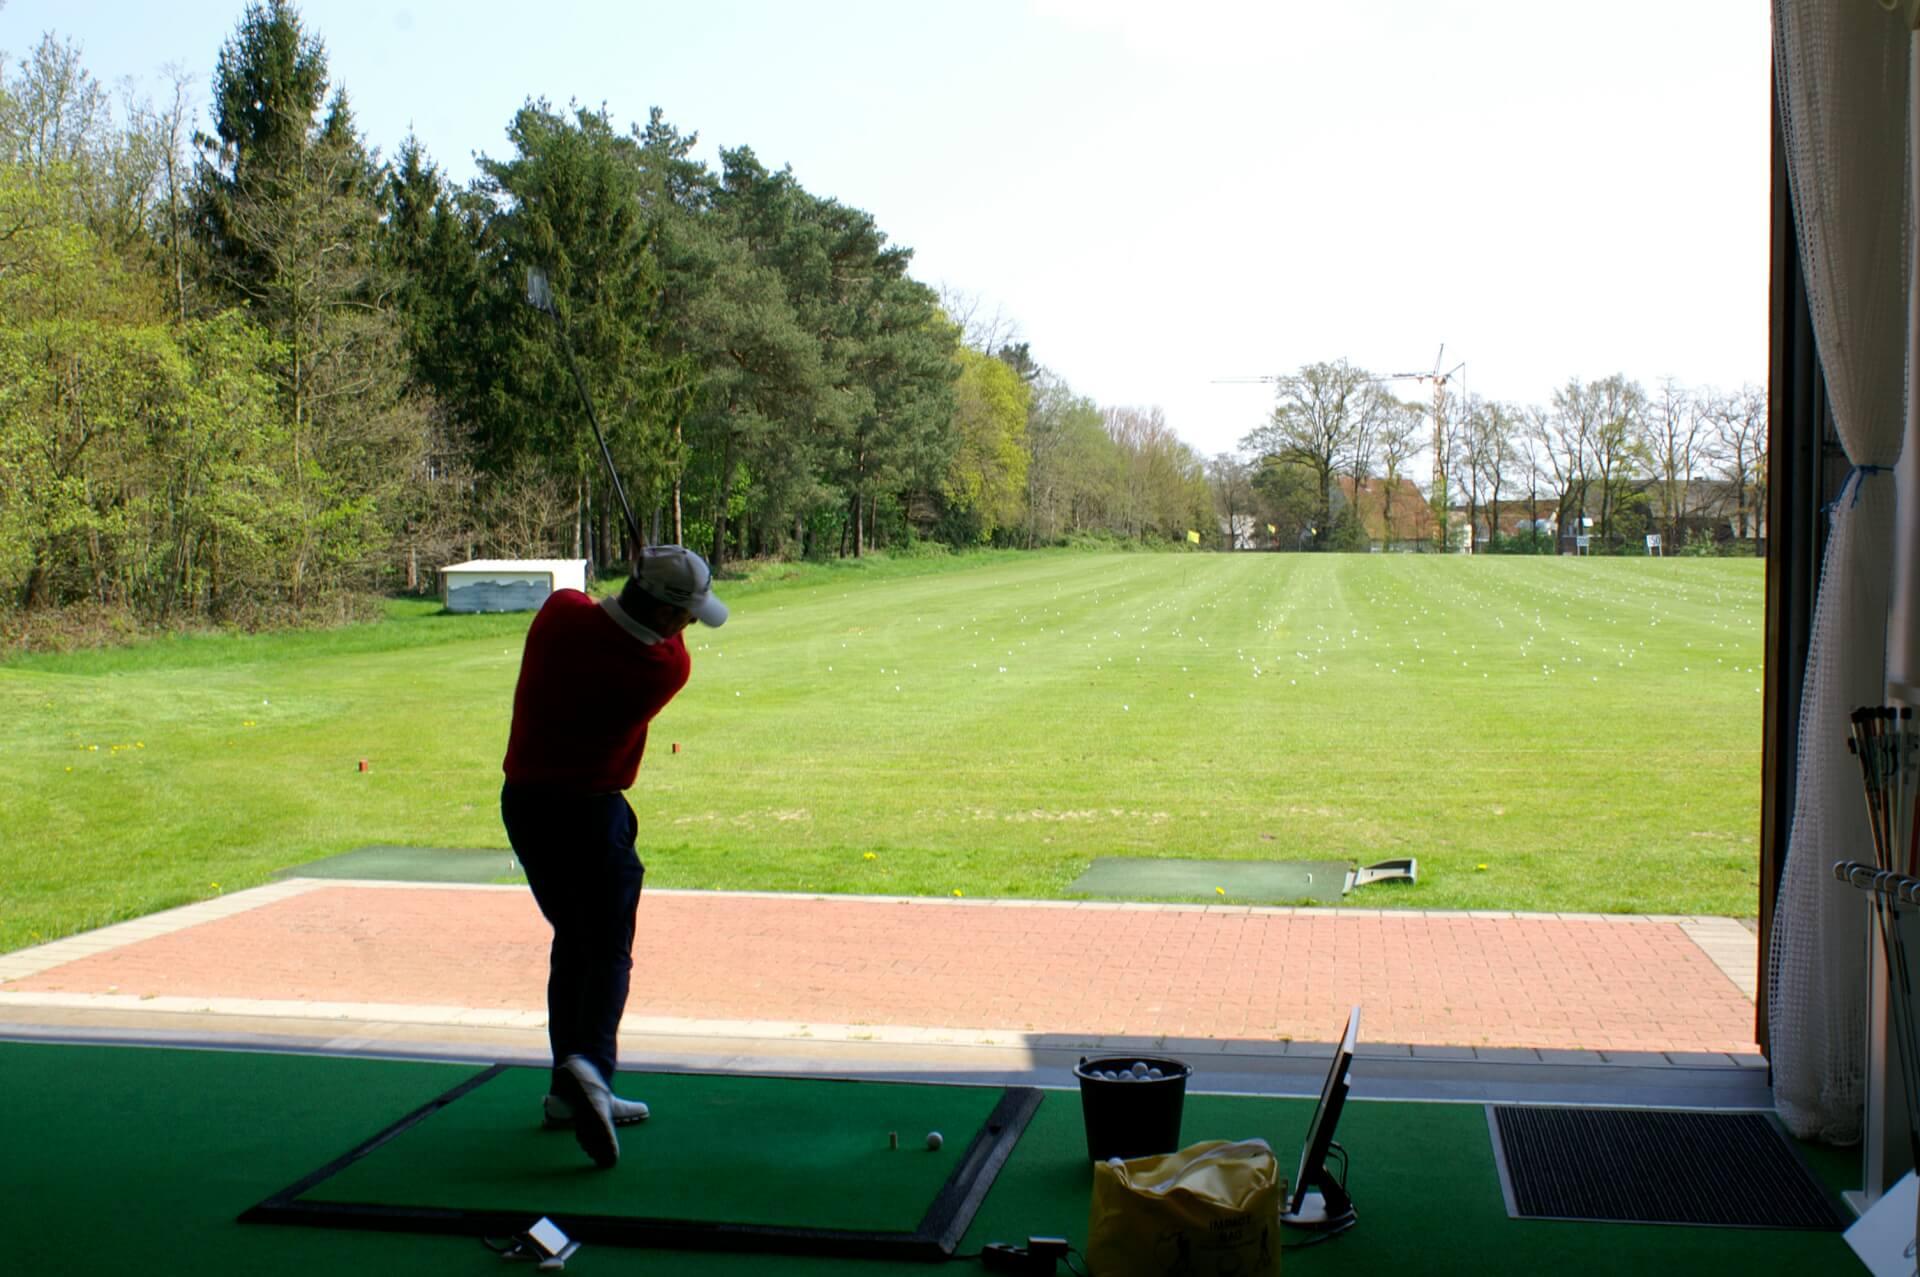 https://golfclub-peckeloh.de/wp-content/uploads/2018/02/PICT0128-1.jpg